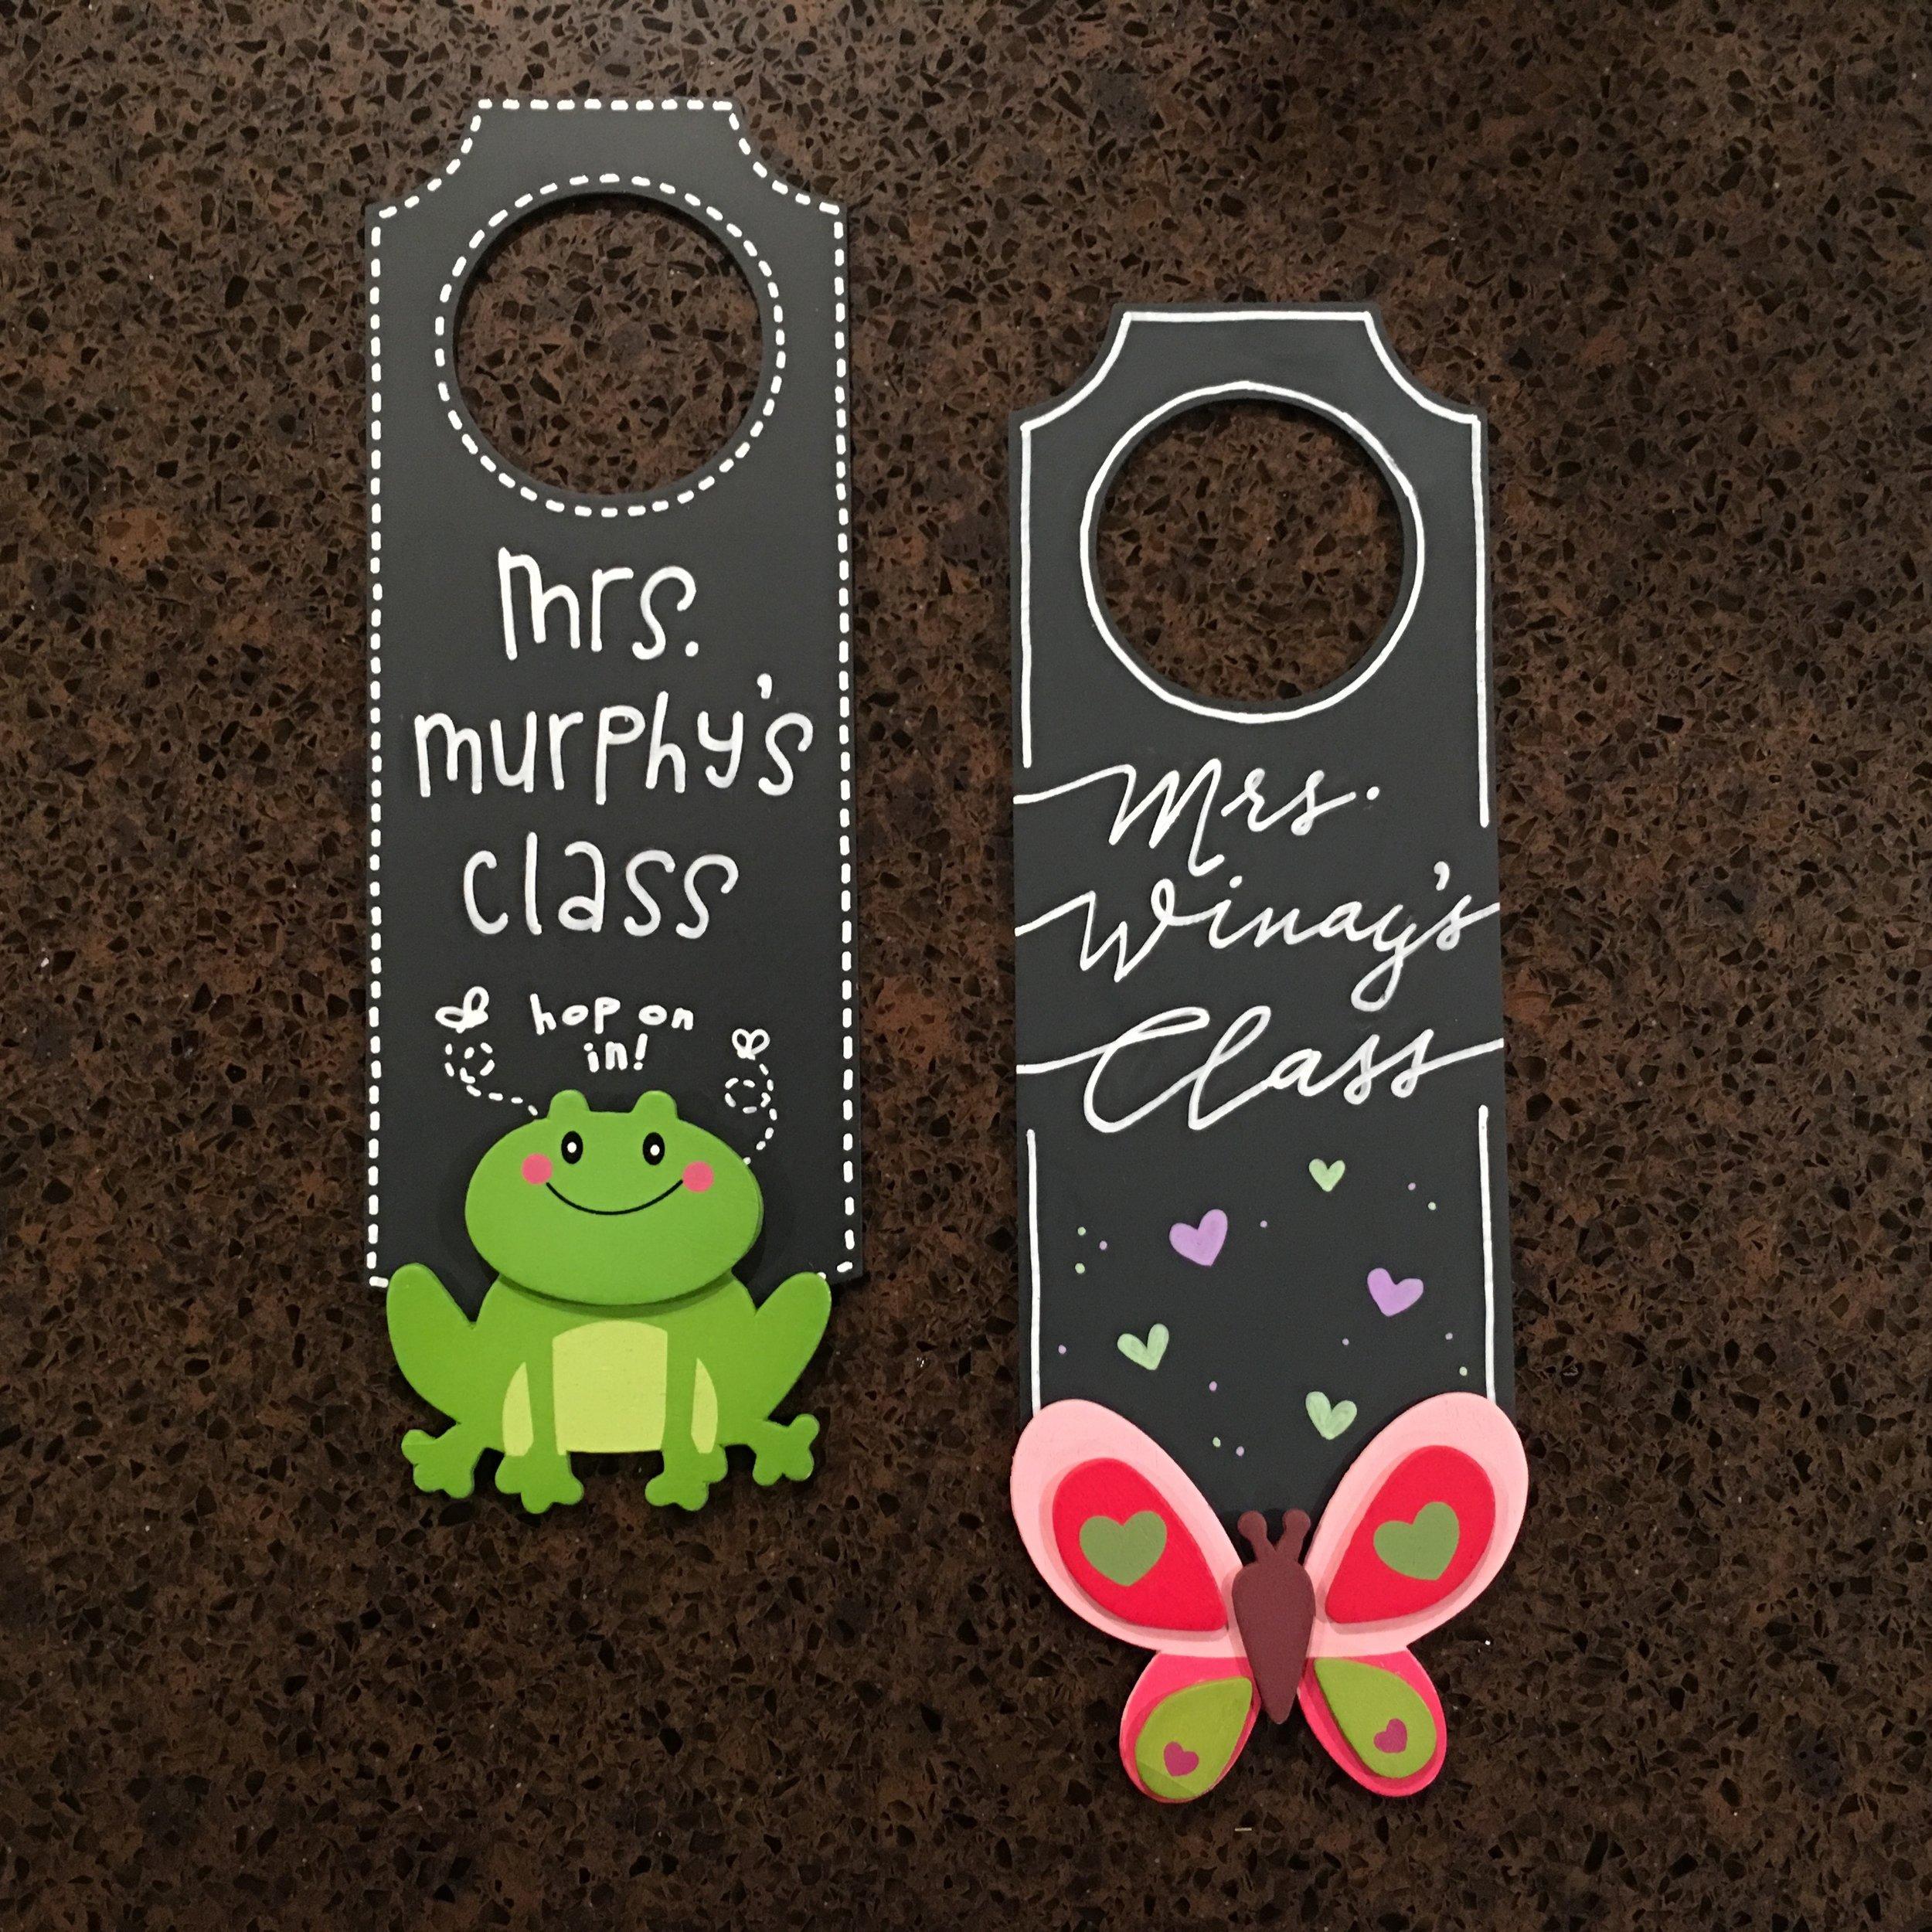 PERSONALIZED DOOR HANGERS IN THE CLASSROOM THEME